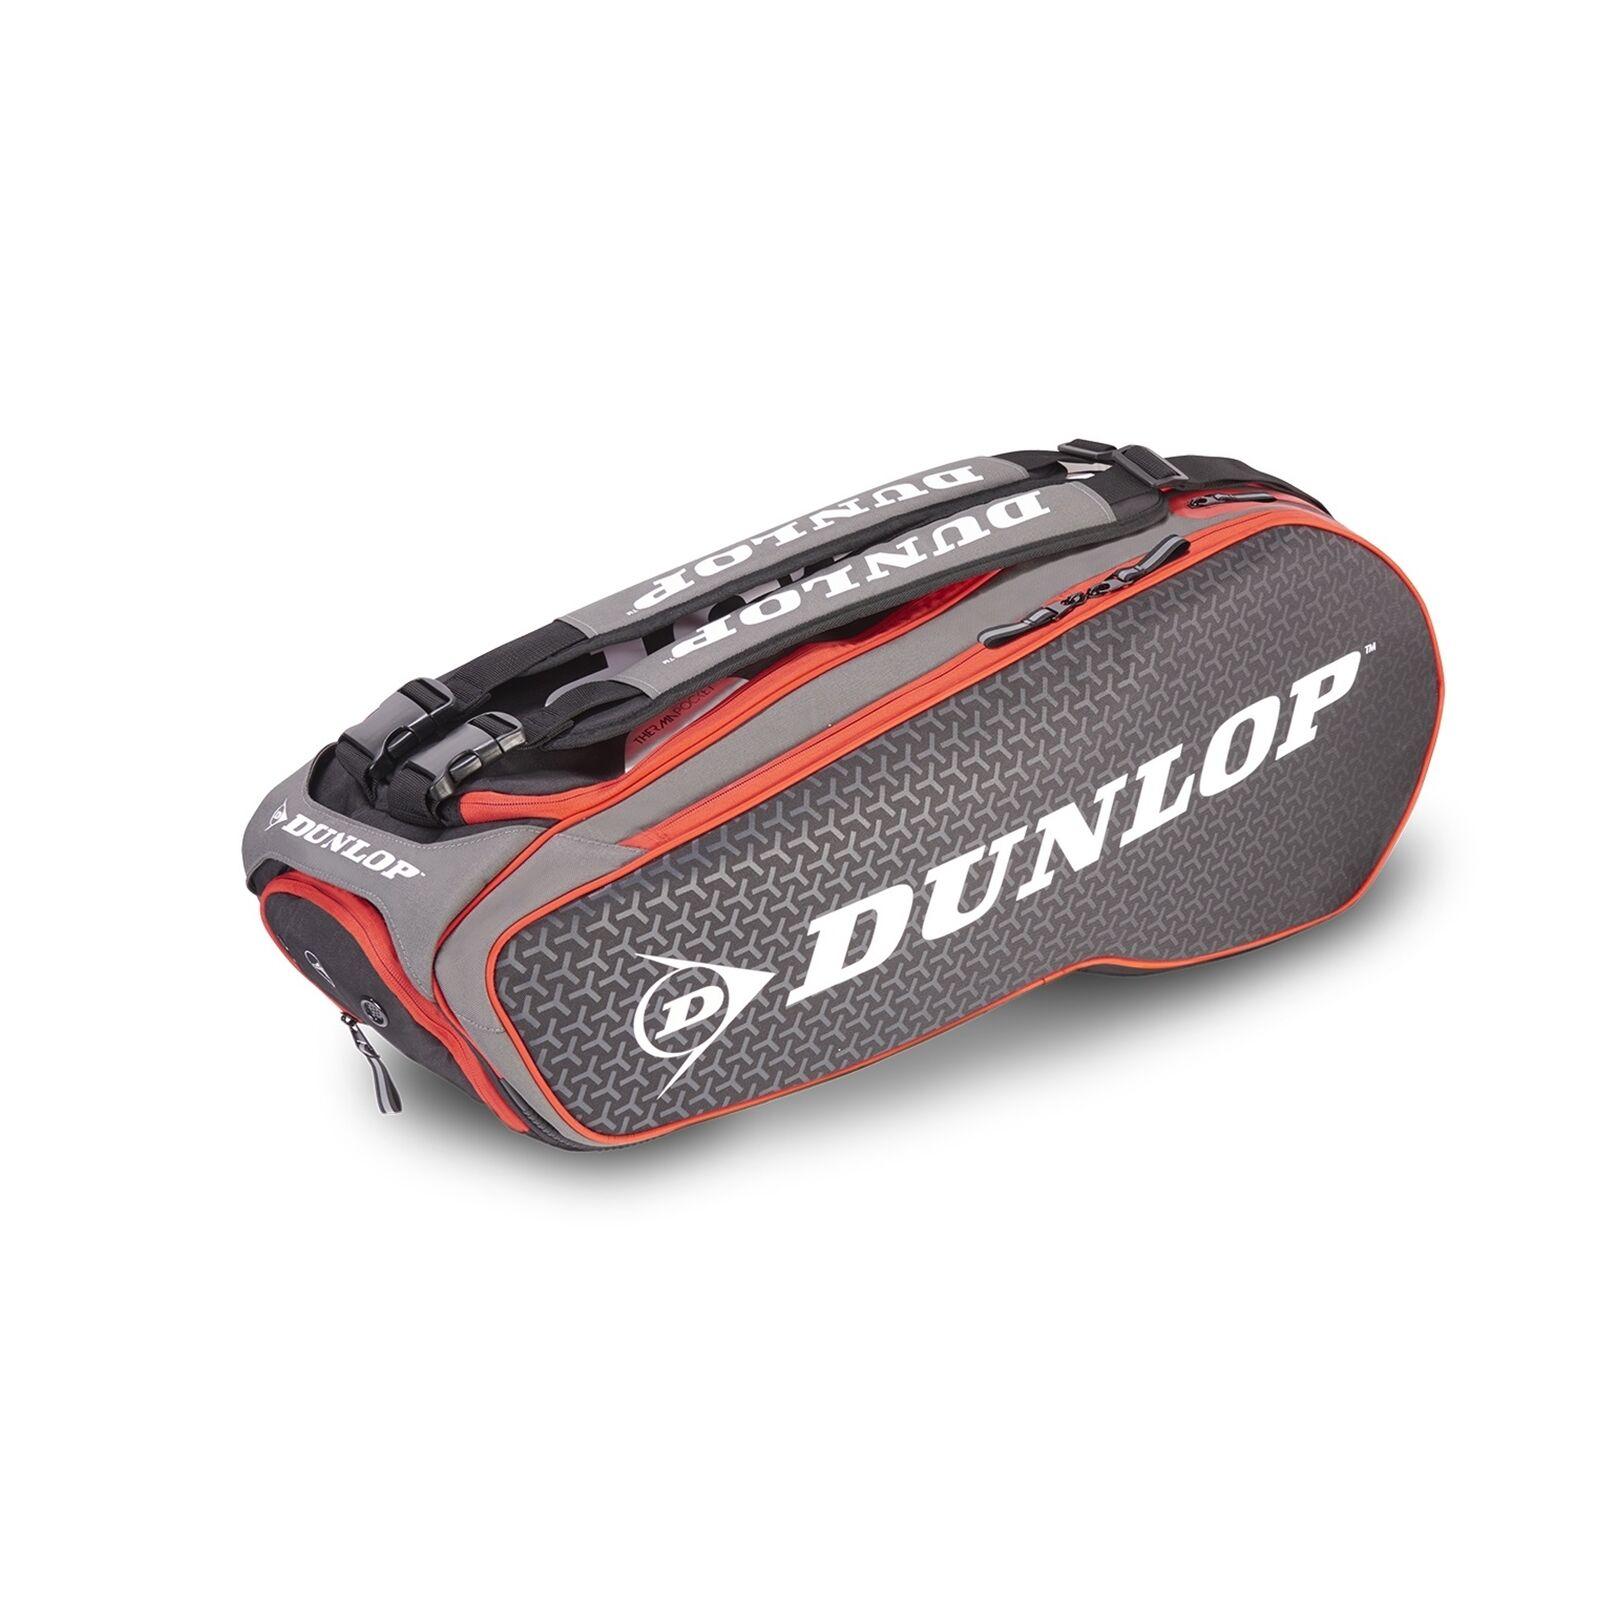 Dunlop Performance 8 Racket Bag Black